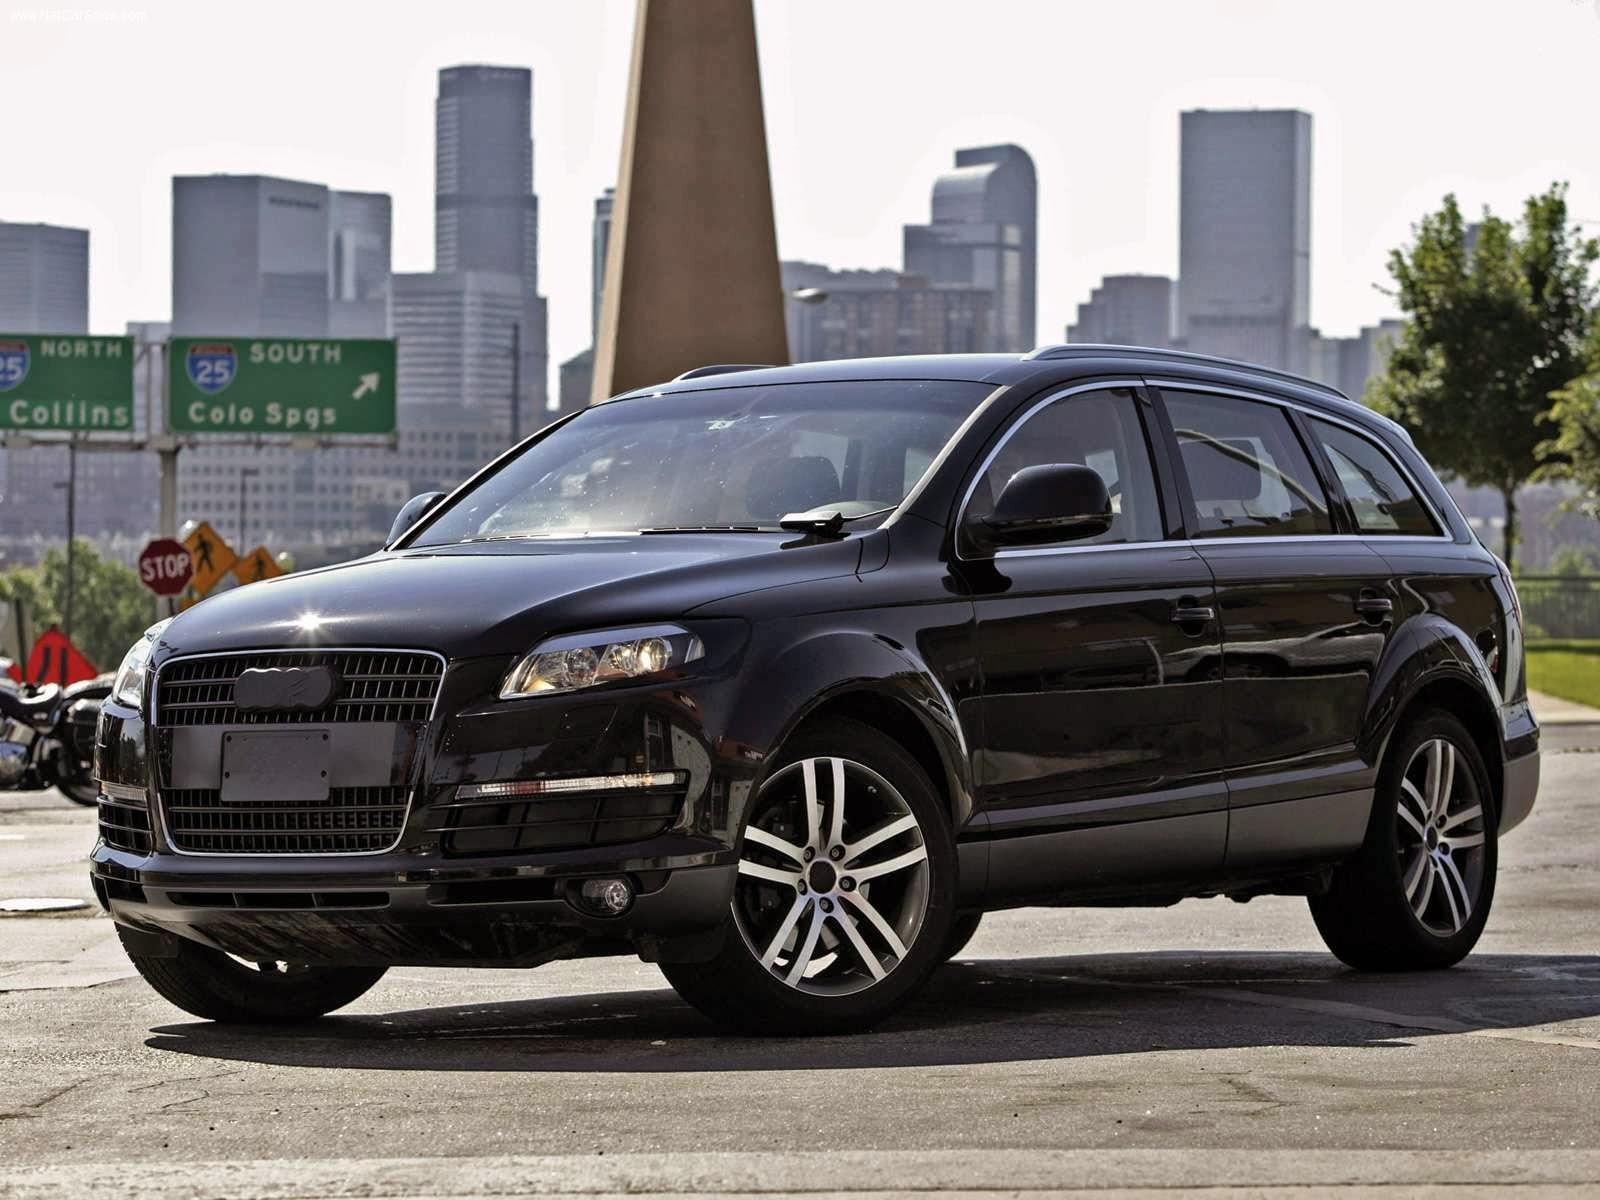 Educate All Universities The All New Audi Q - Audi suv q7 price